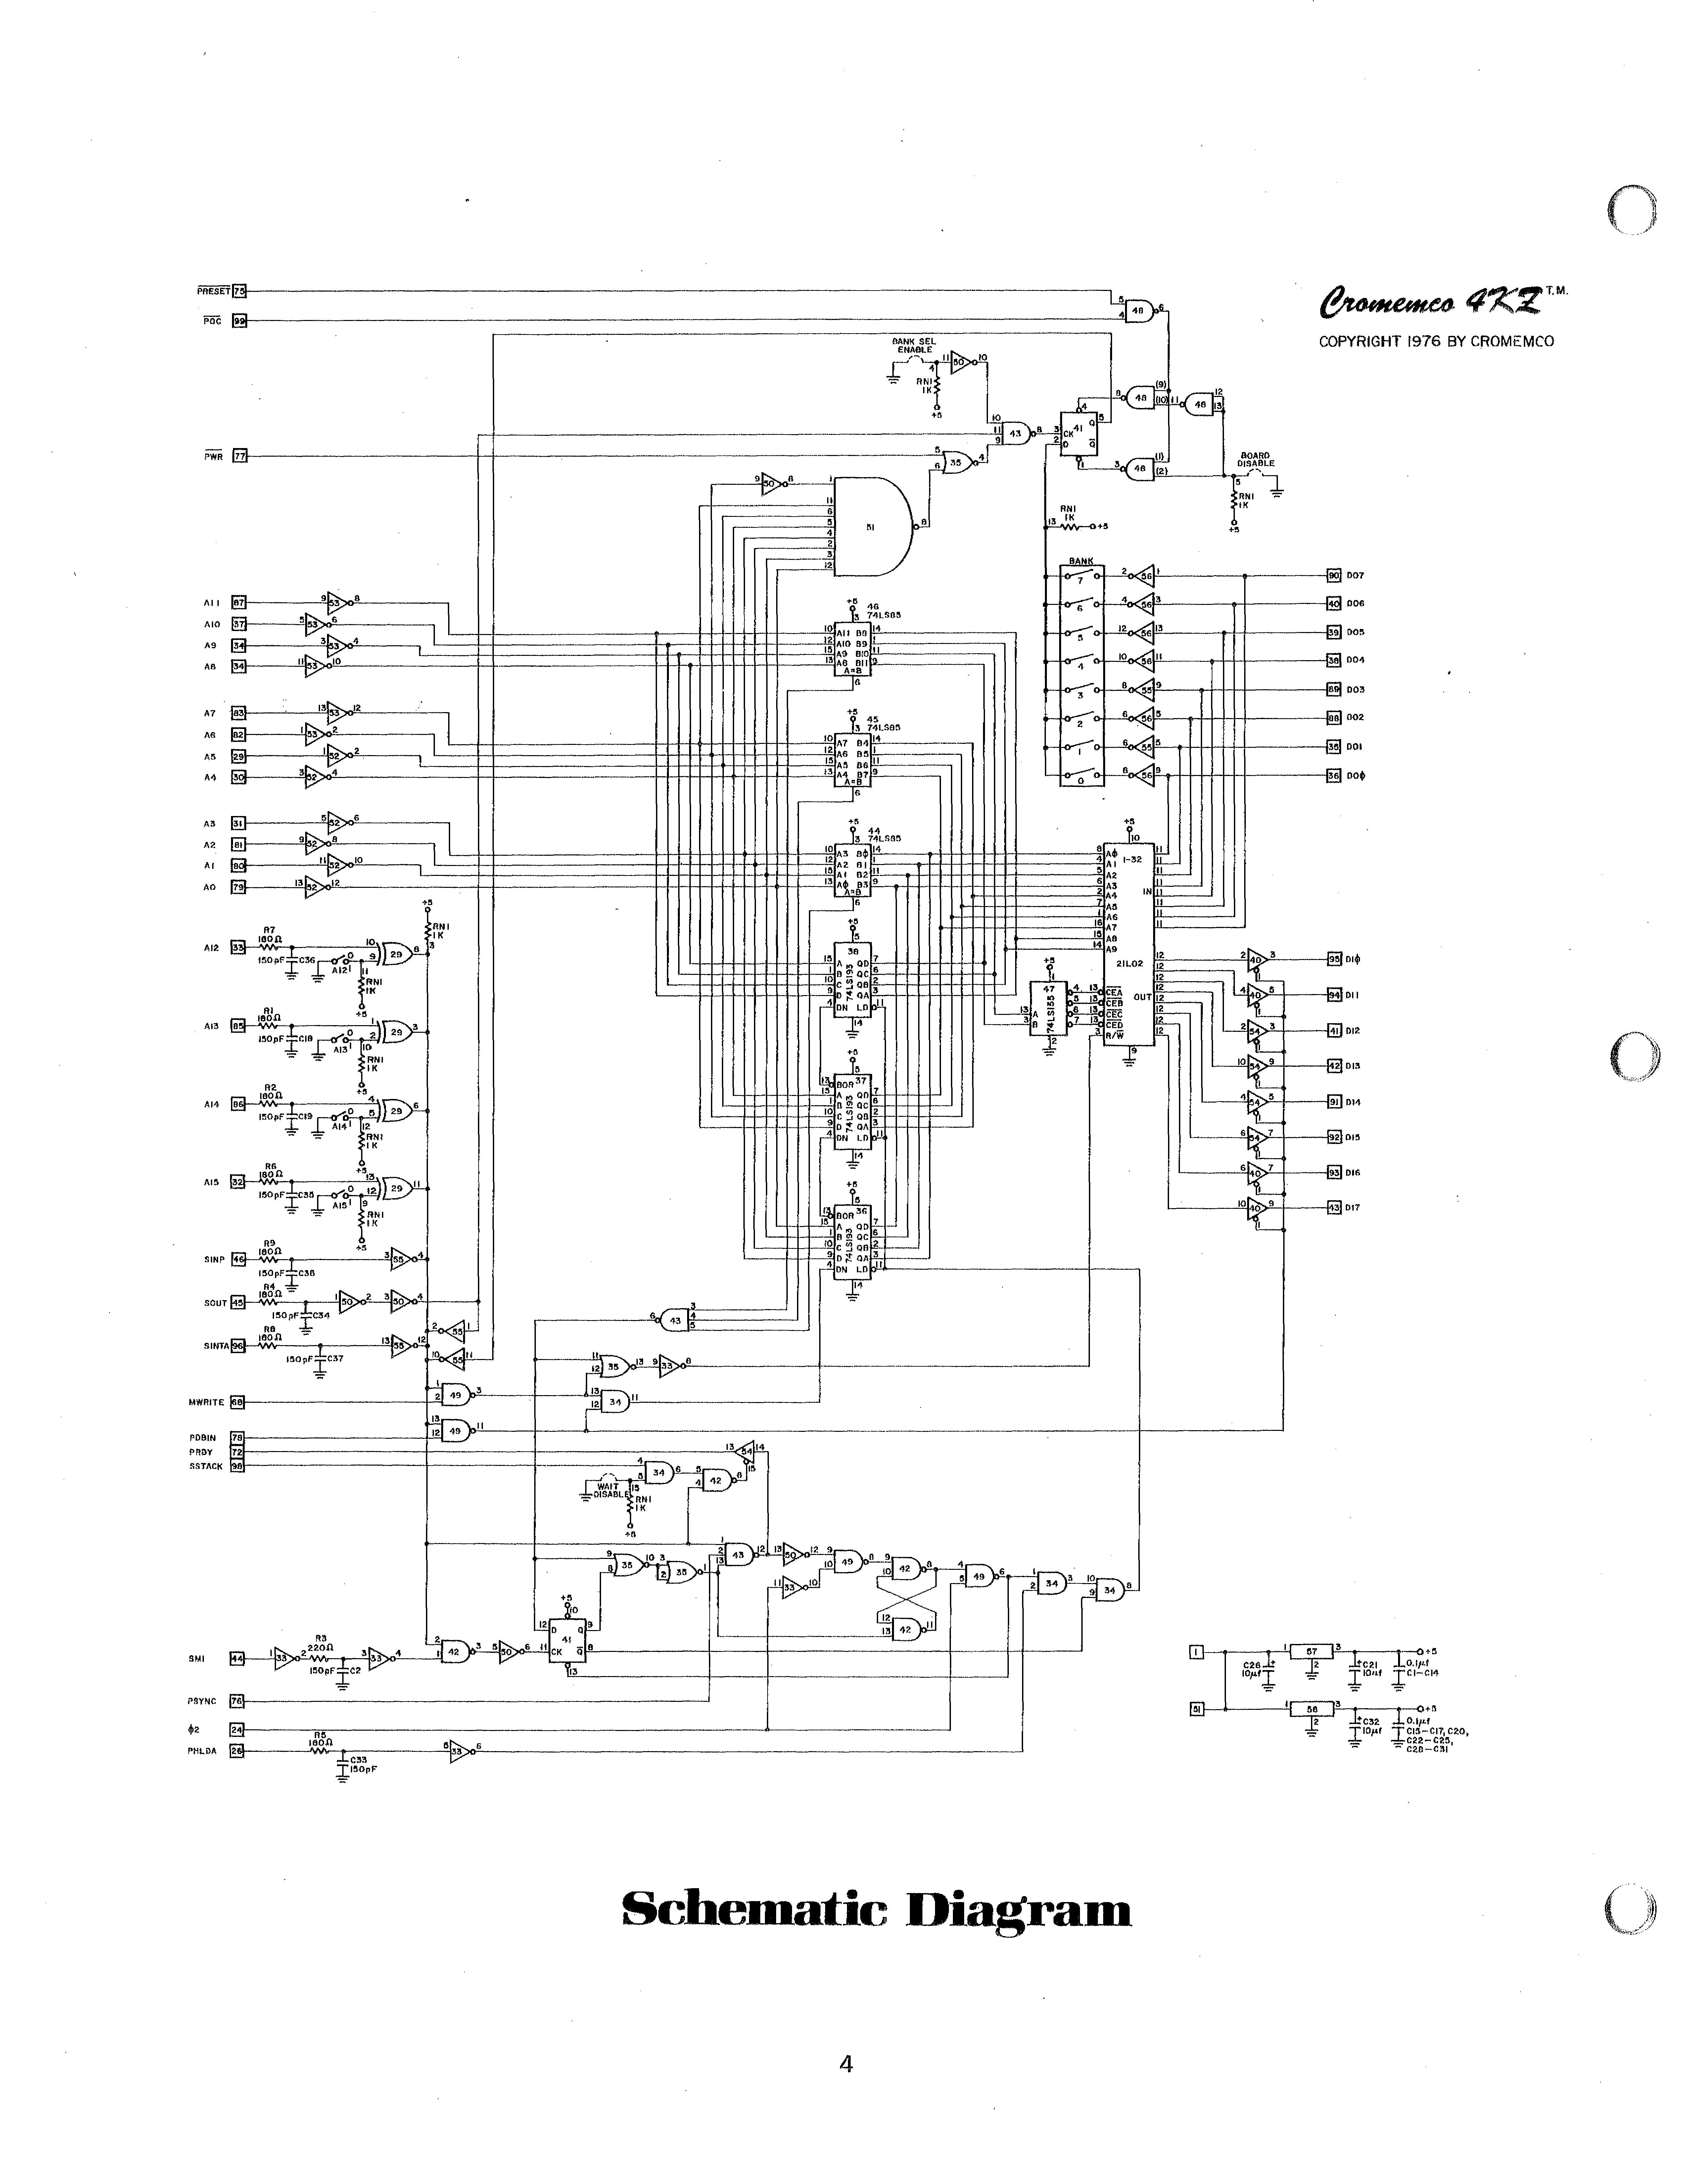 S-100 Bus / IEEE-696 Archive: Cromemco Manuals